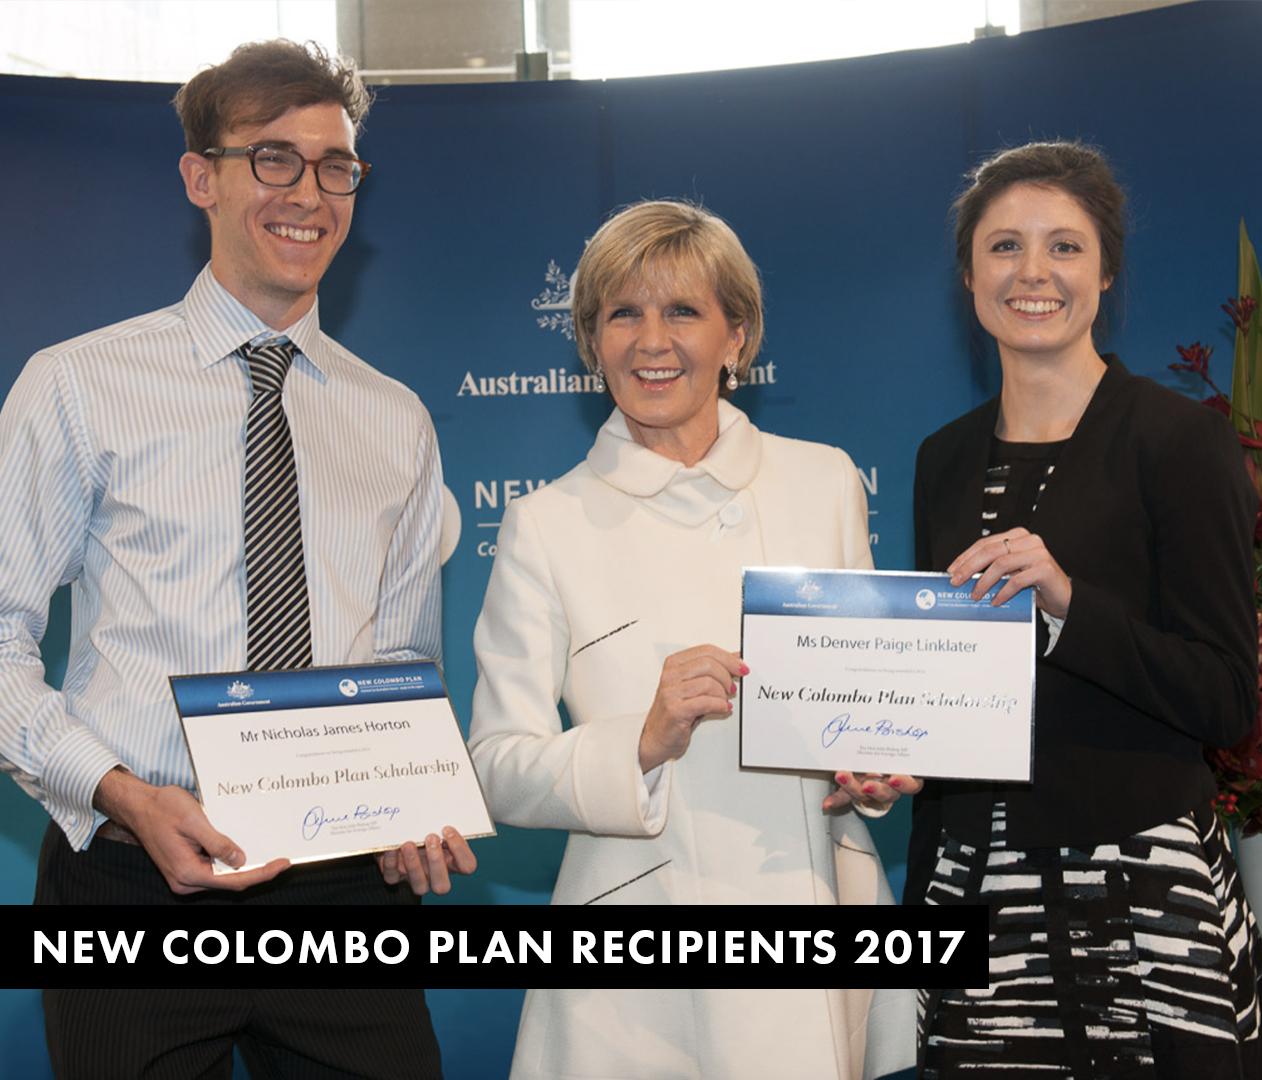 New Colombo Recipients 2017.jpg